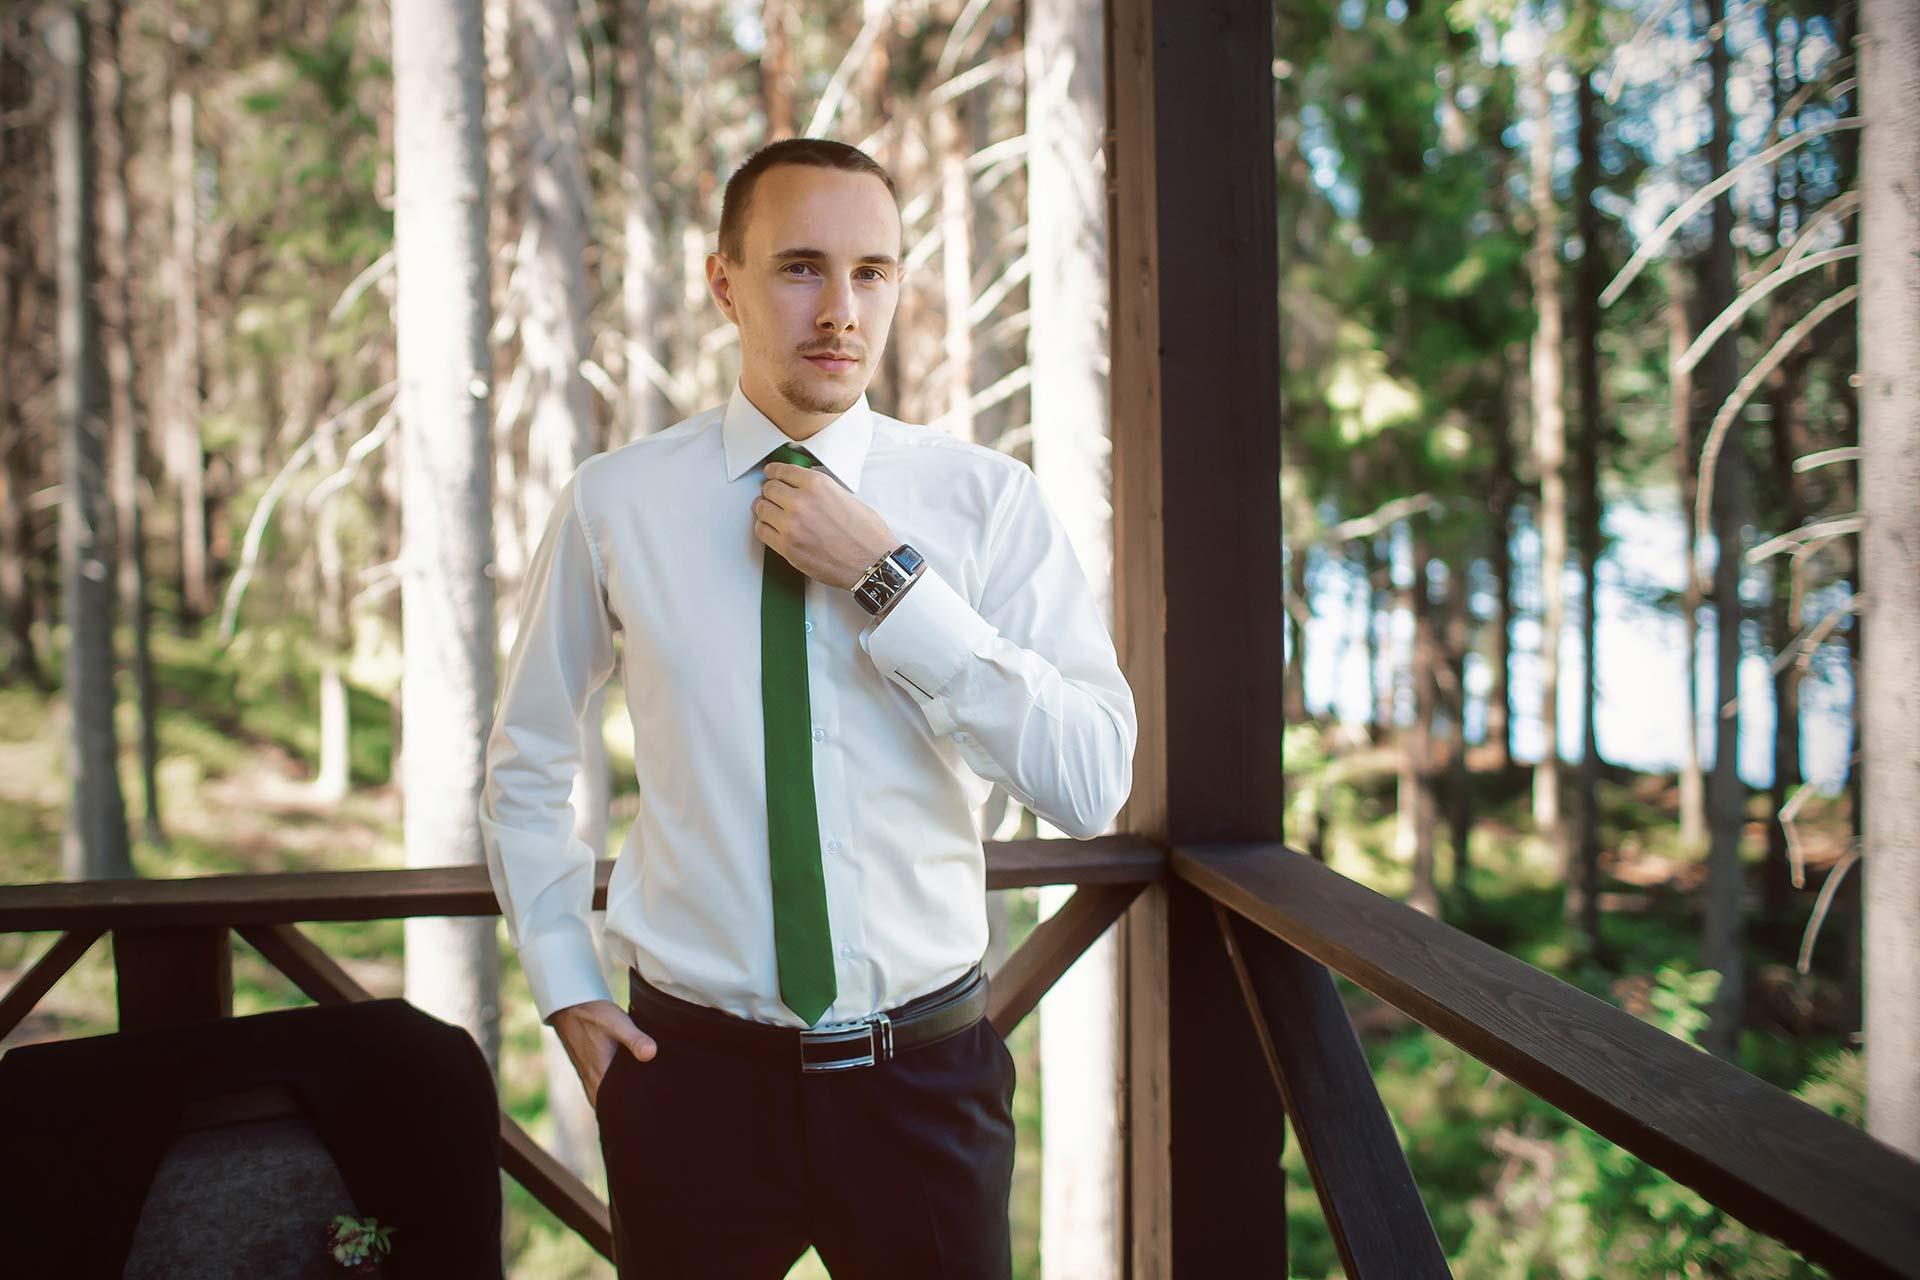 Александр Семёнов, рекламное агентство Royal Advertising